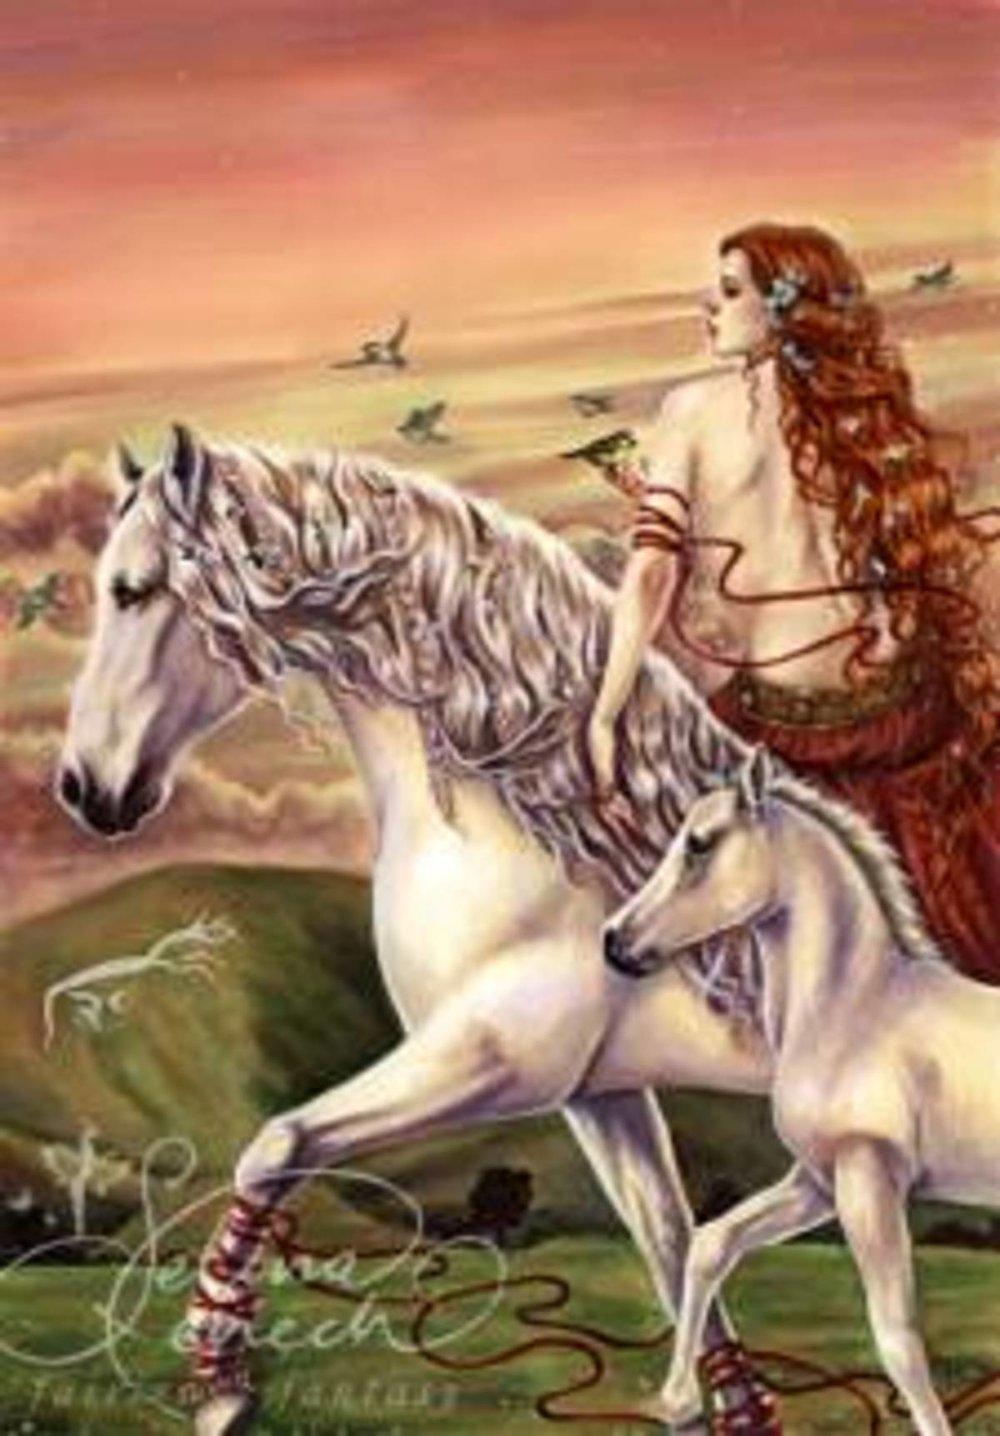 Rhiannons Ride